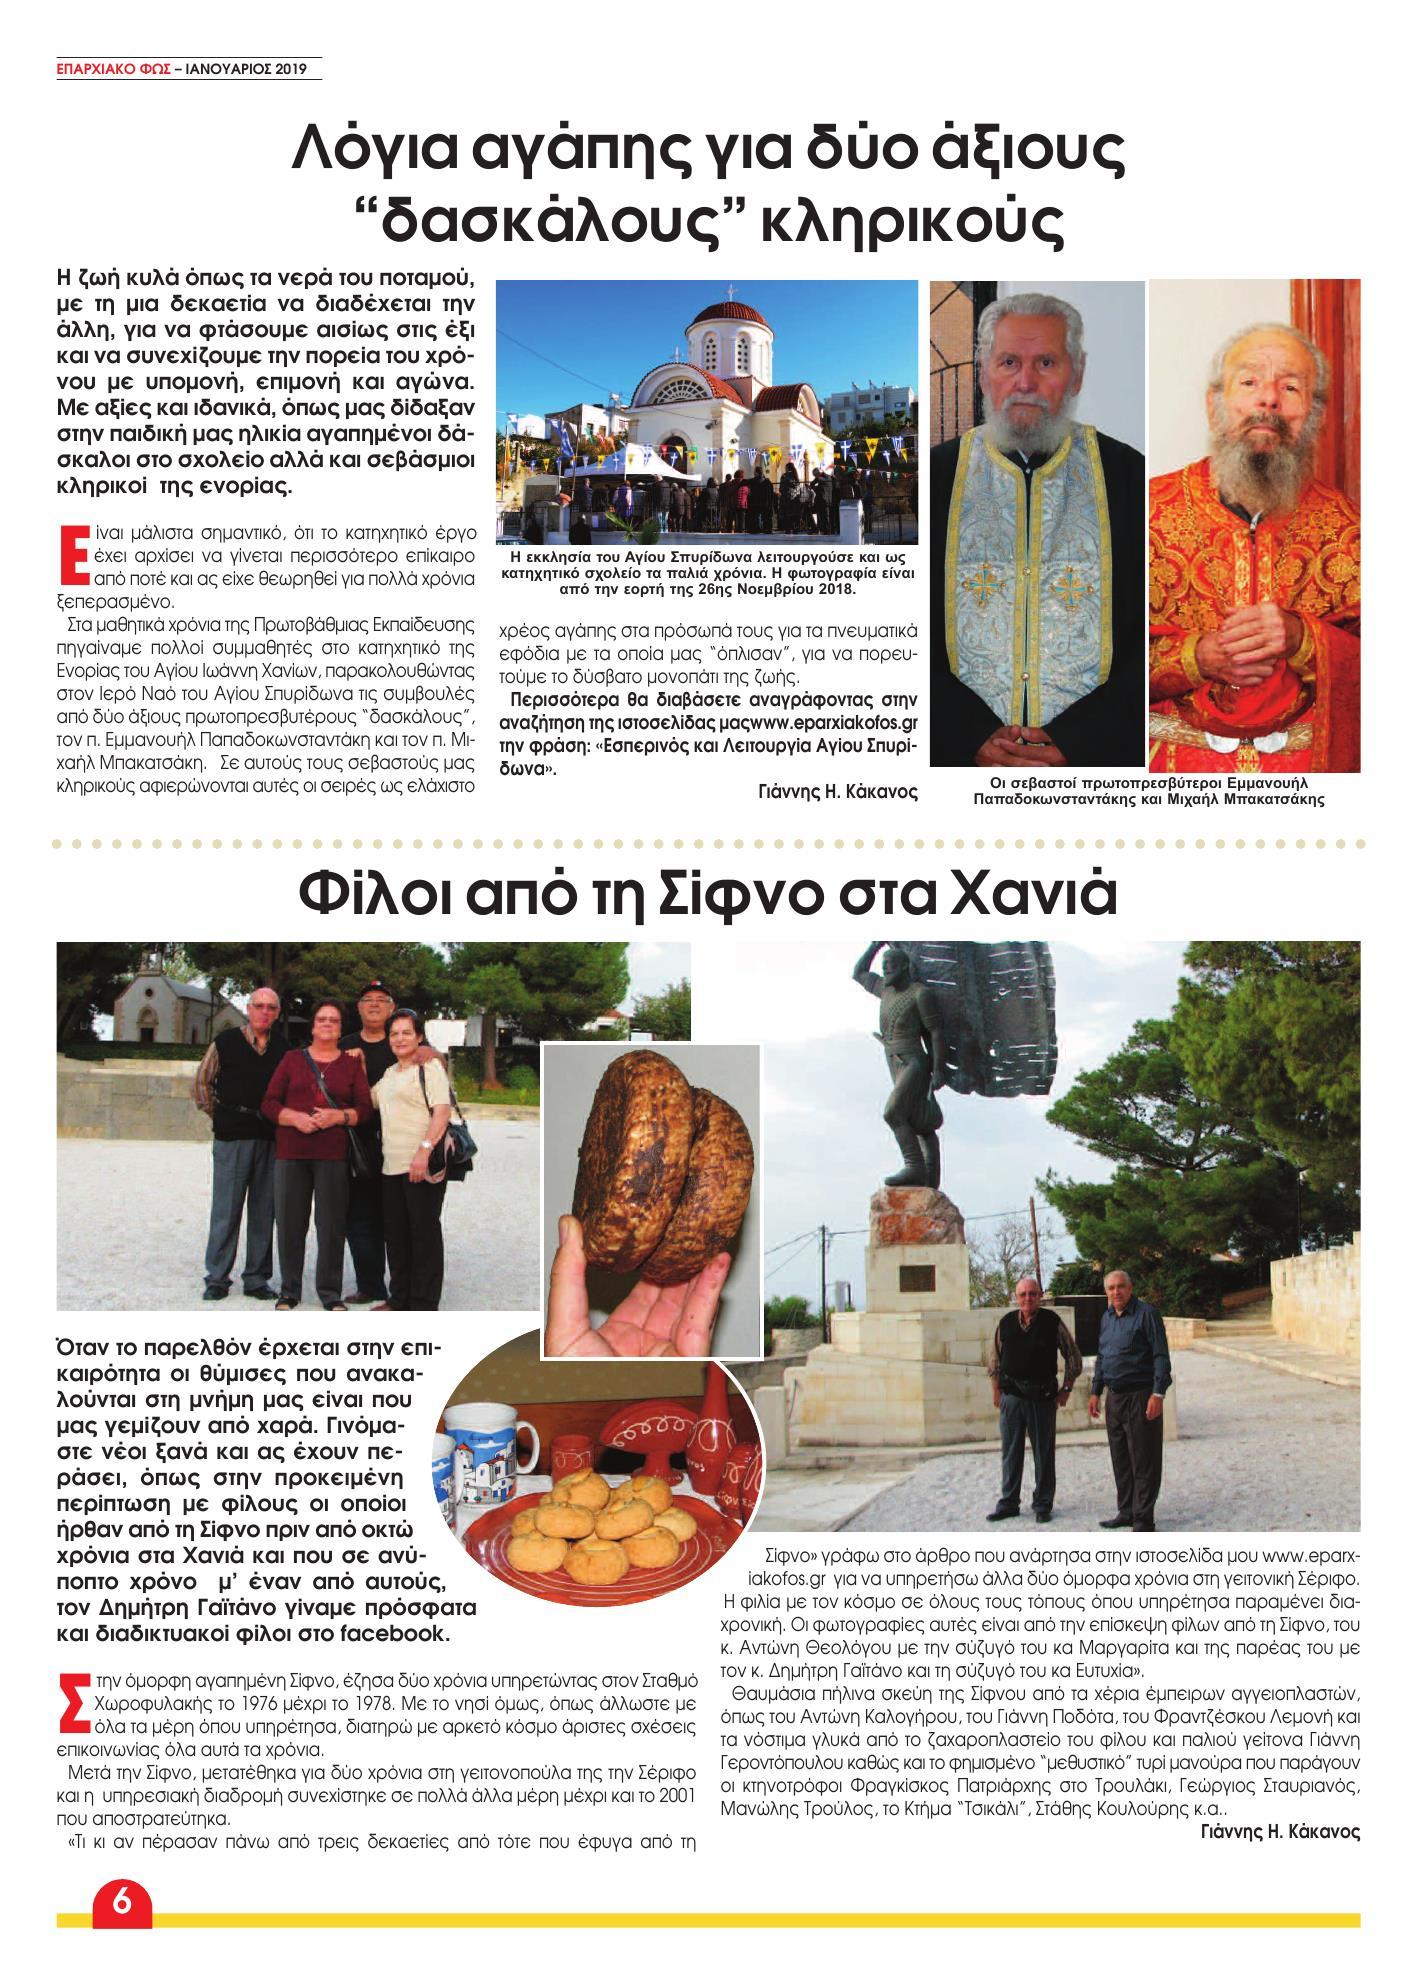 23 KAKANOULHS (Page 06)